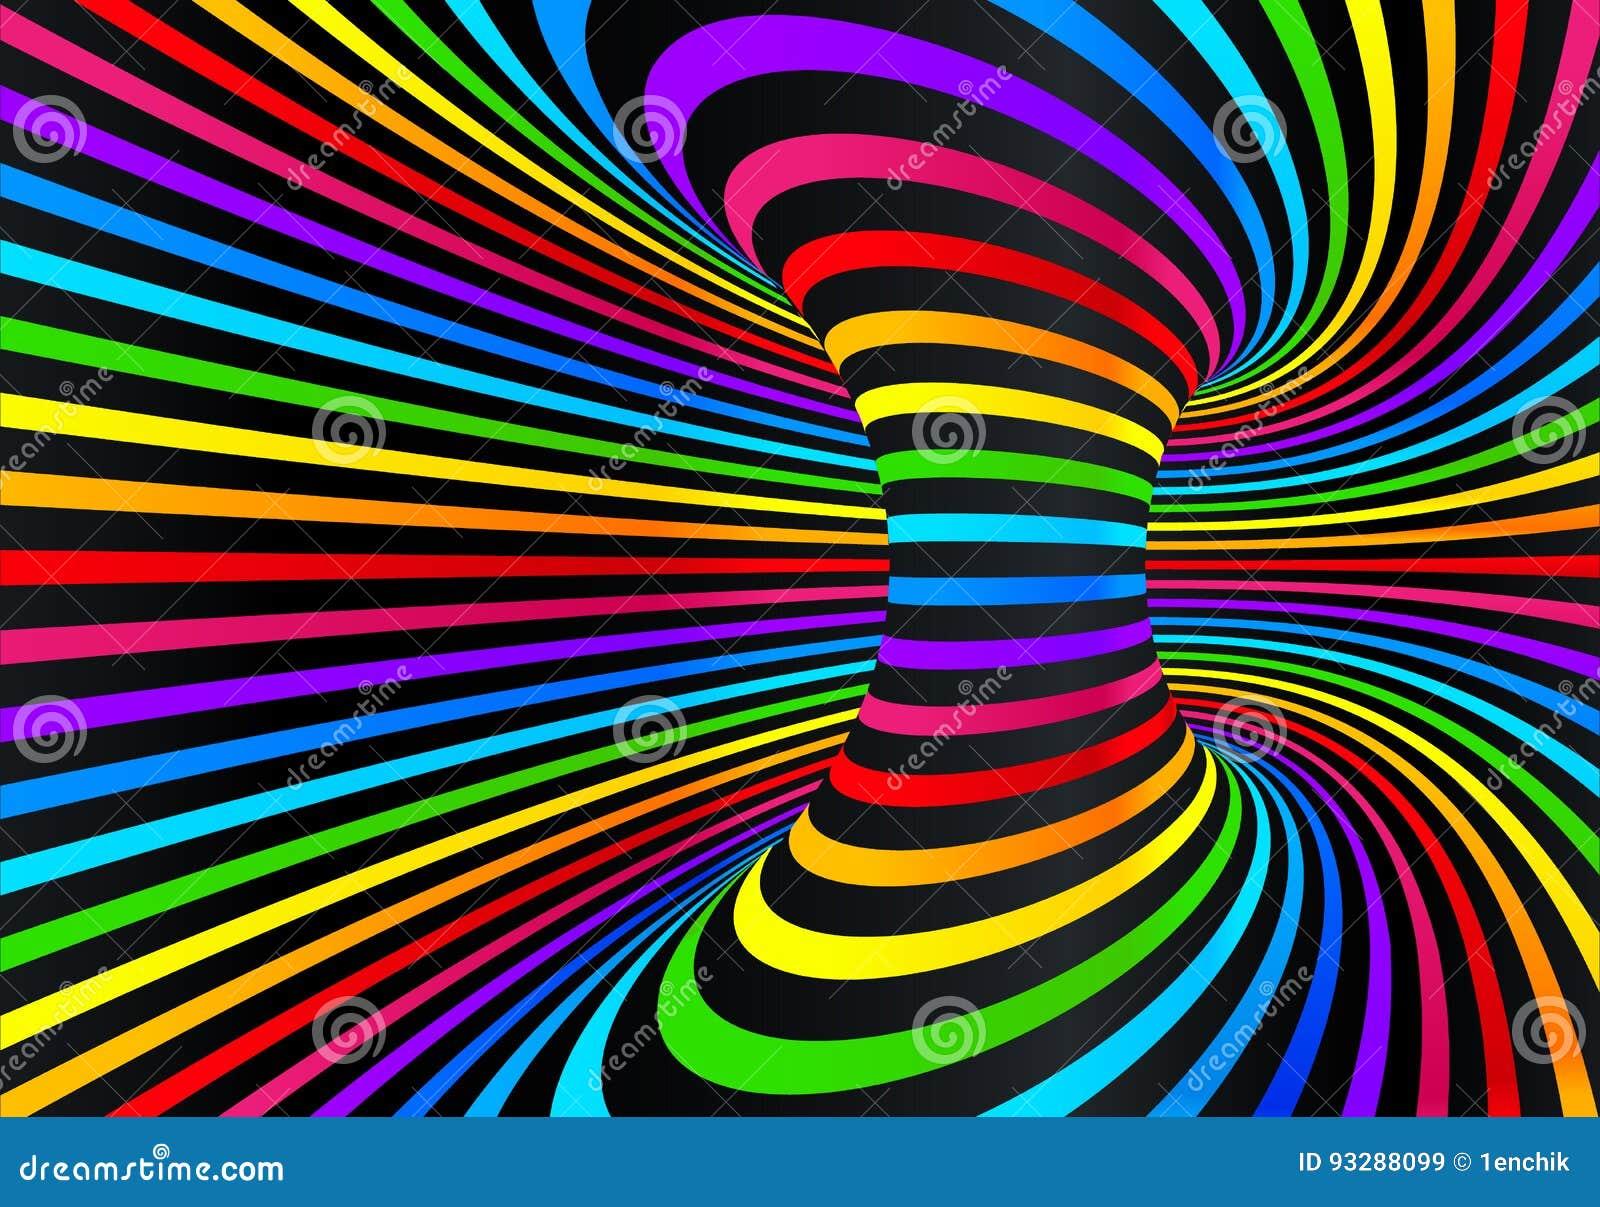 Dark neon rainbow colors vector abstract disco background